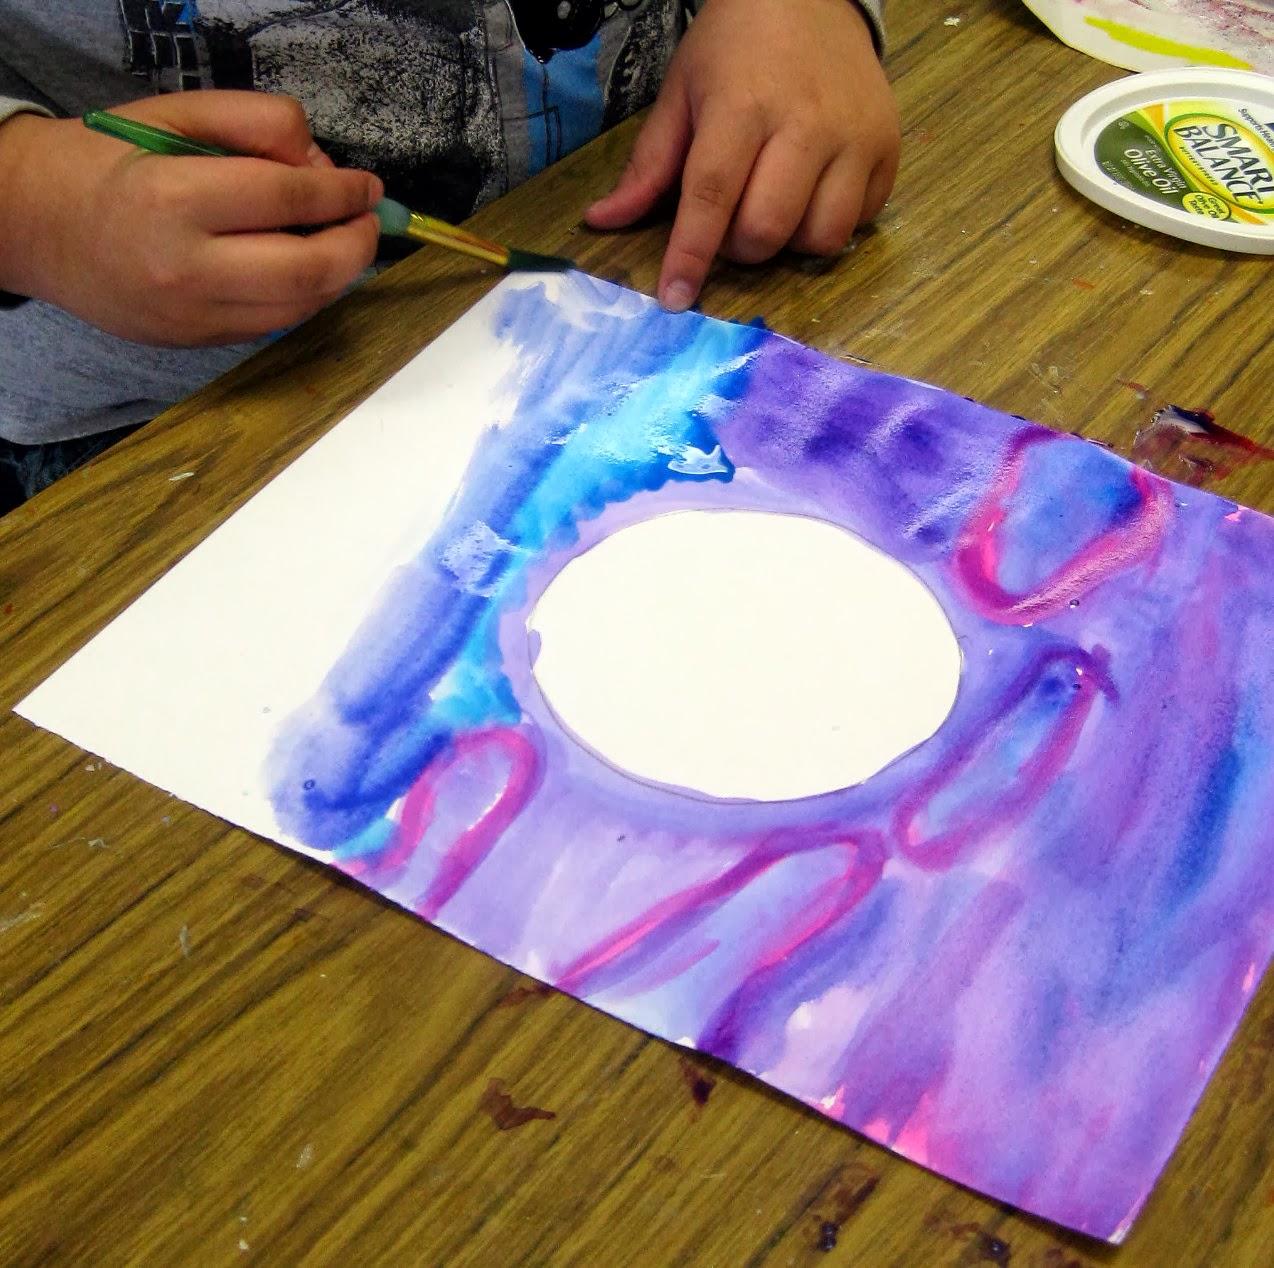 Cassie Stephens painting lesson for children